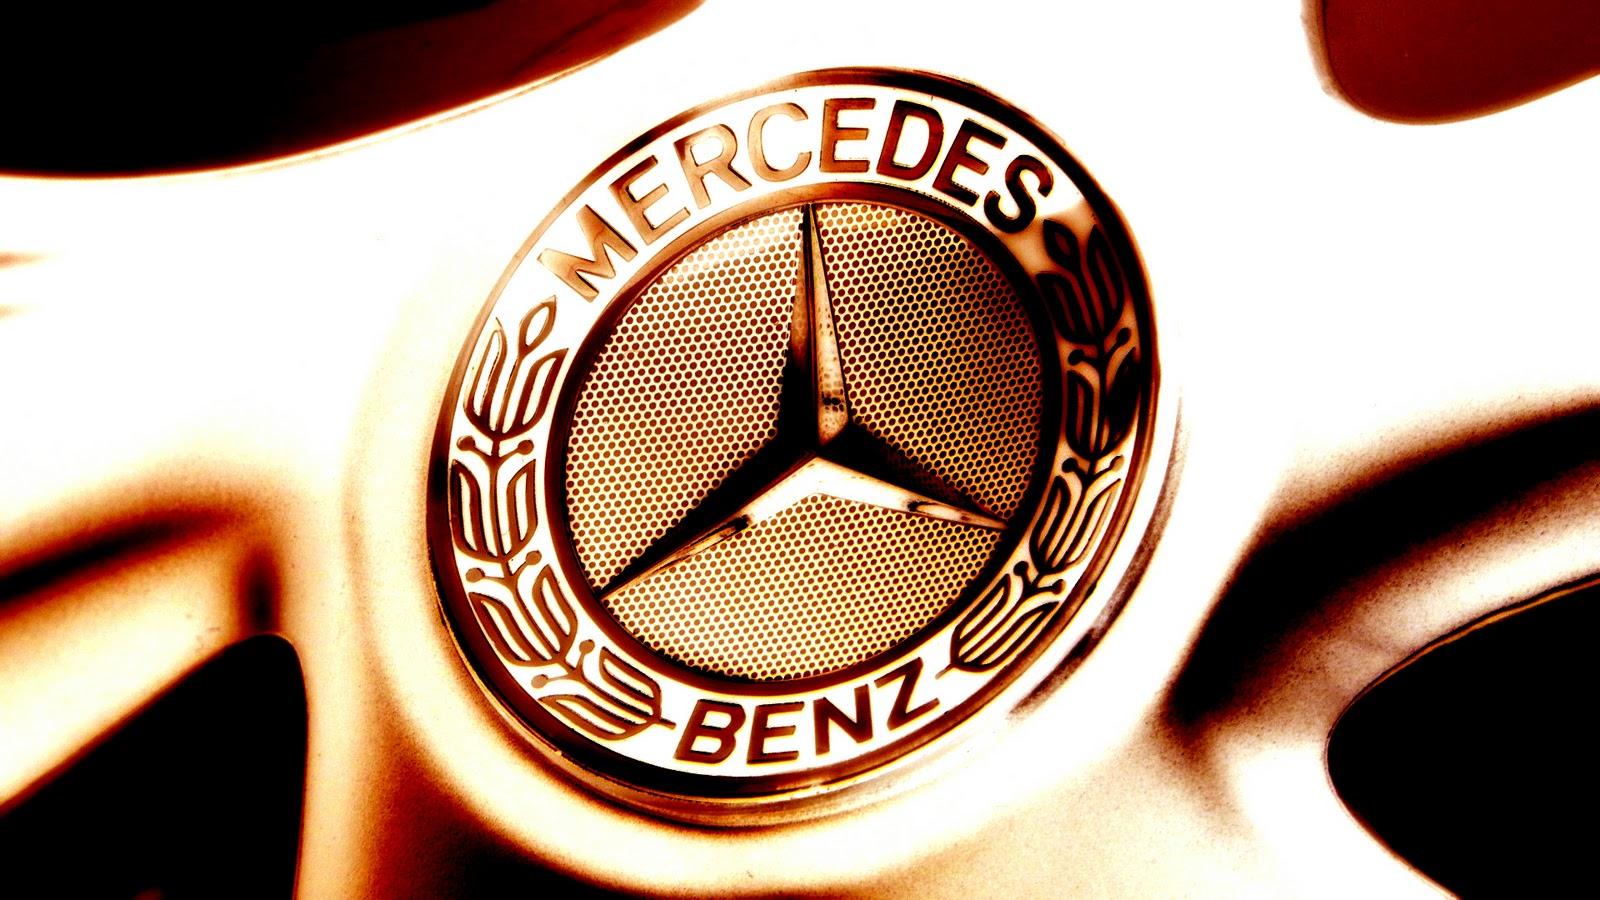 50 Mercedes Benz Logo Wallpapers On Wallpapersafari